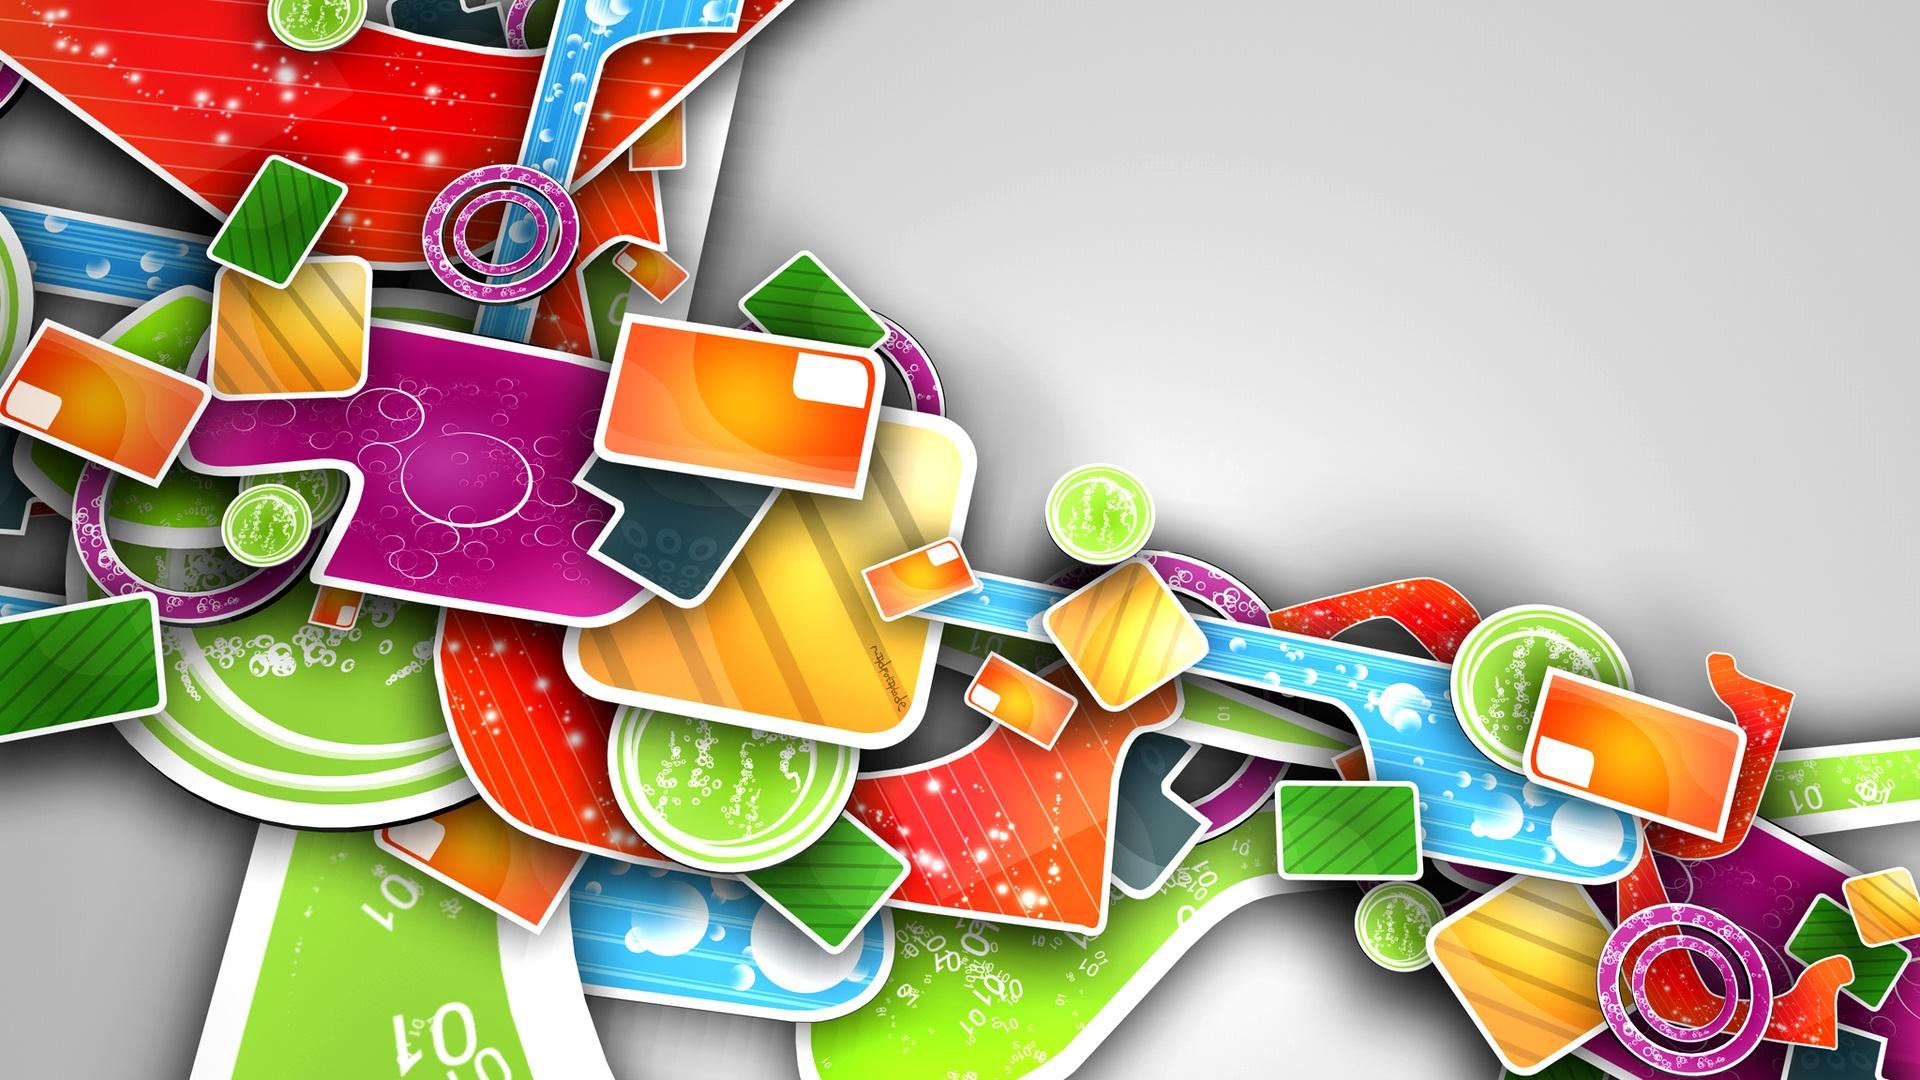 Hd wallpaper colorful - Colourful Wallpaper Colourful Wallpaper